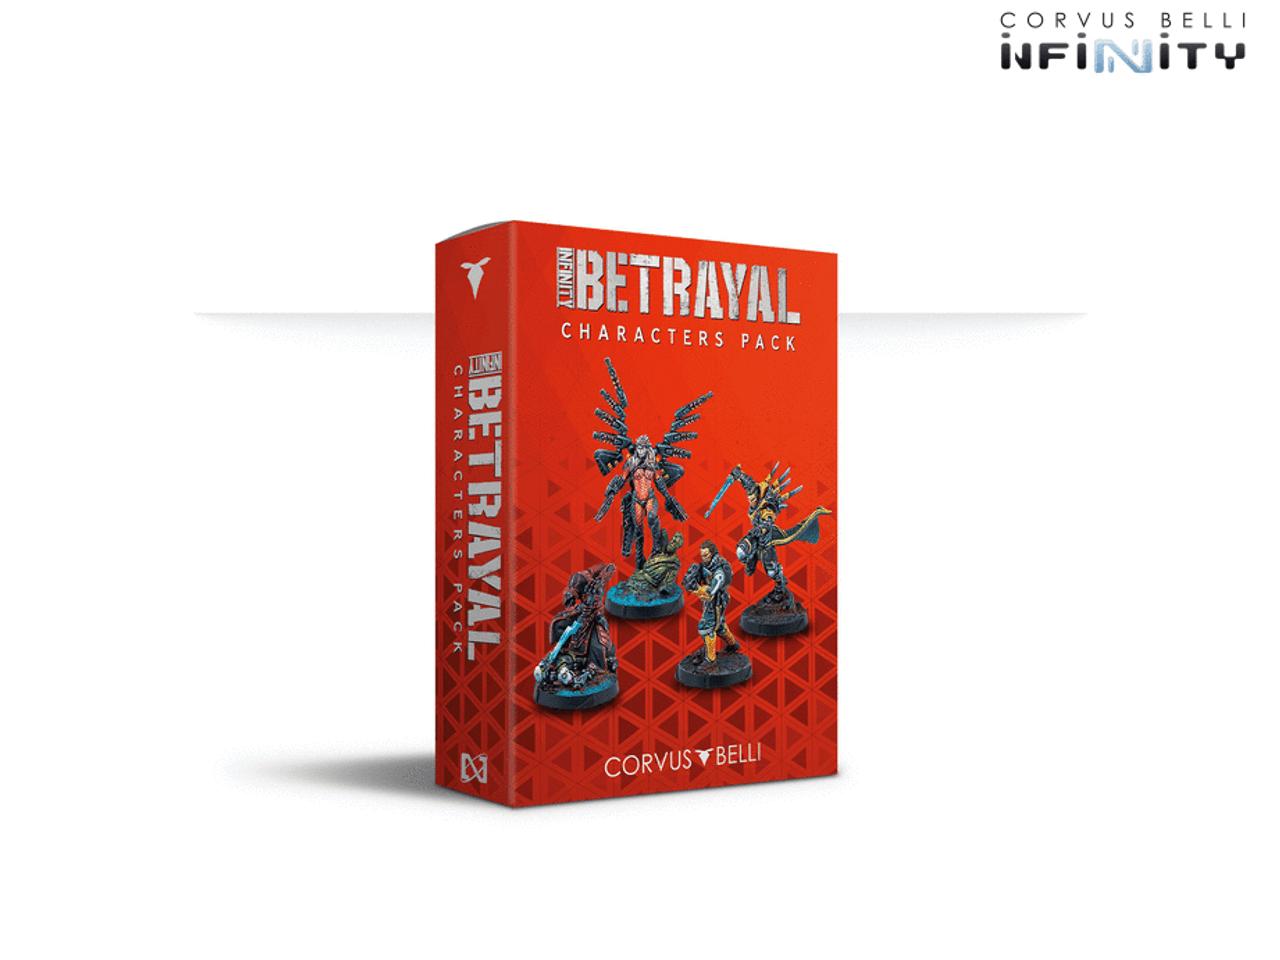 Infinity Characters - Betrayal Characters Pack